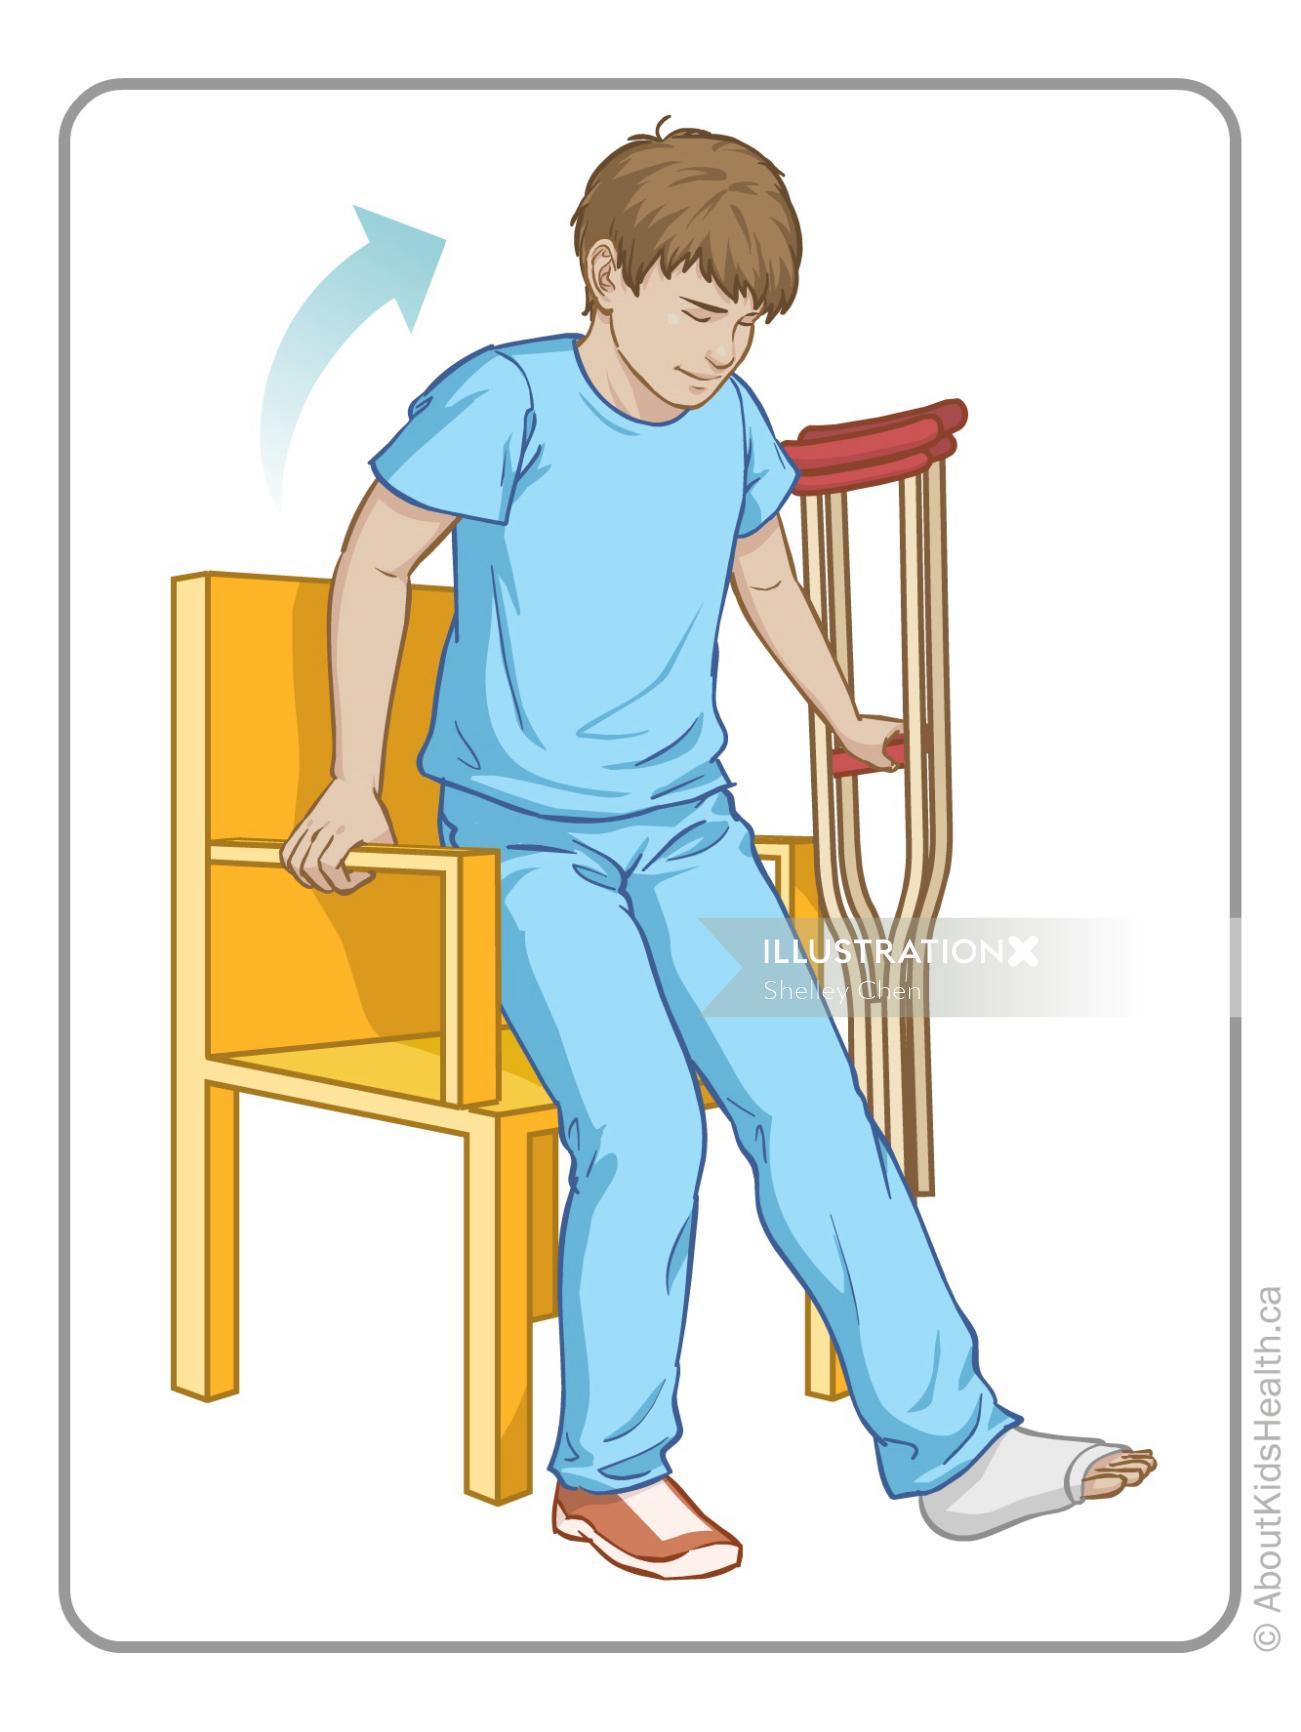 Medical graphic boy broken leg